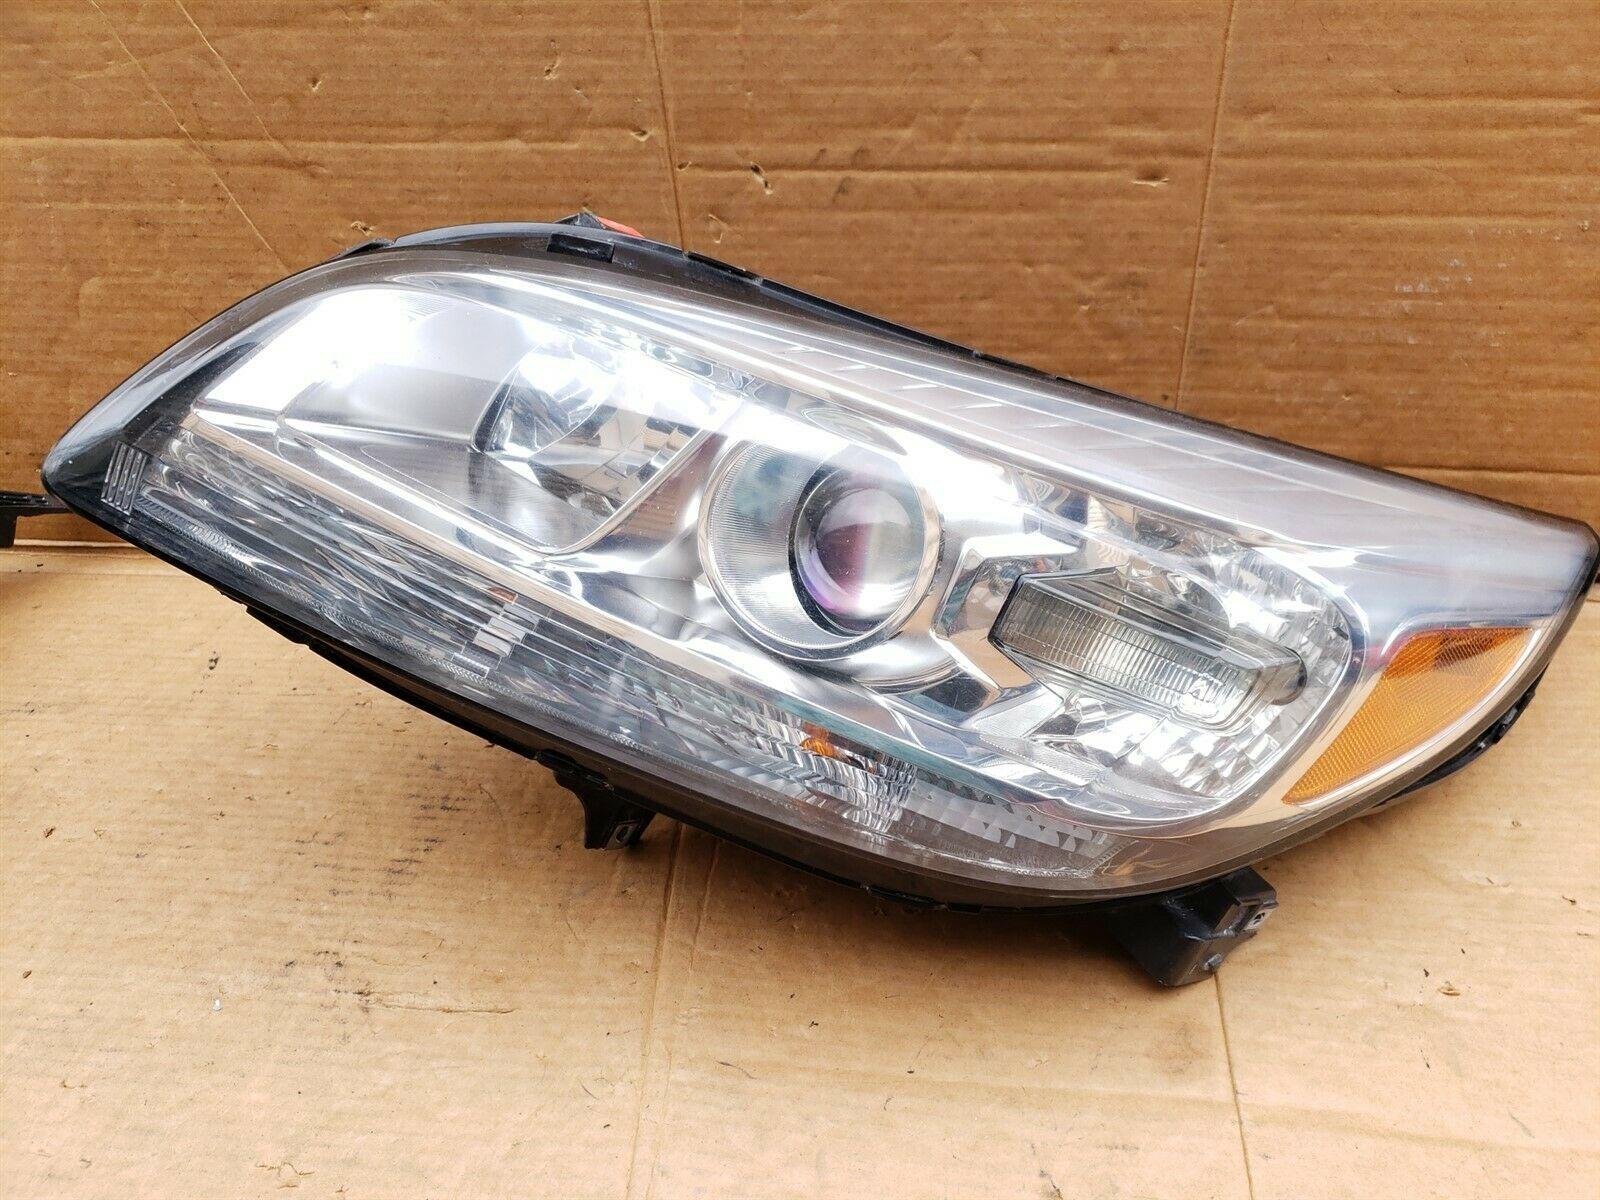 13-16 Chevy Malibu Headlight Head Light Lamp Driver Left LH